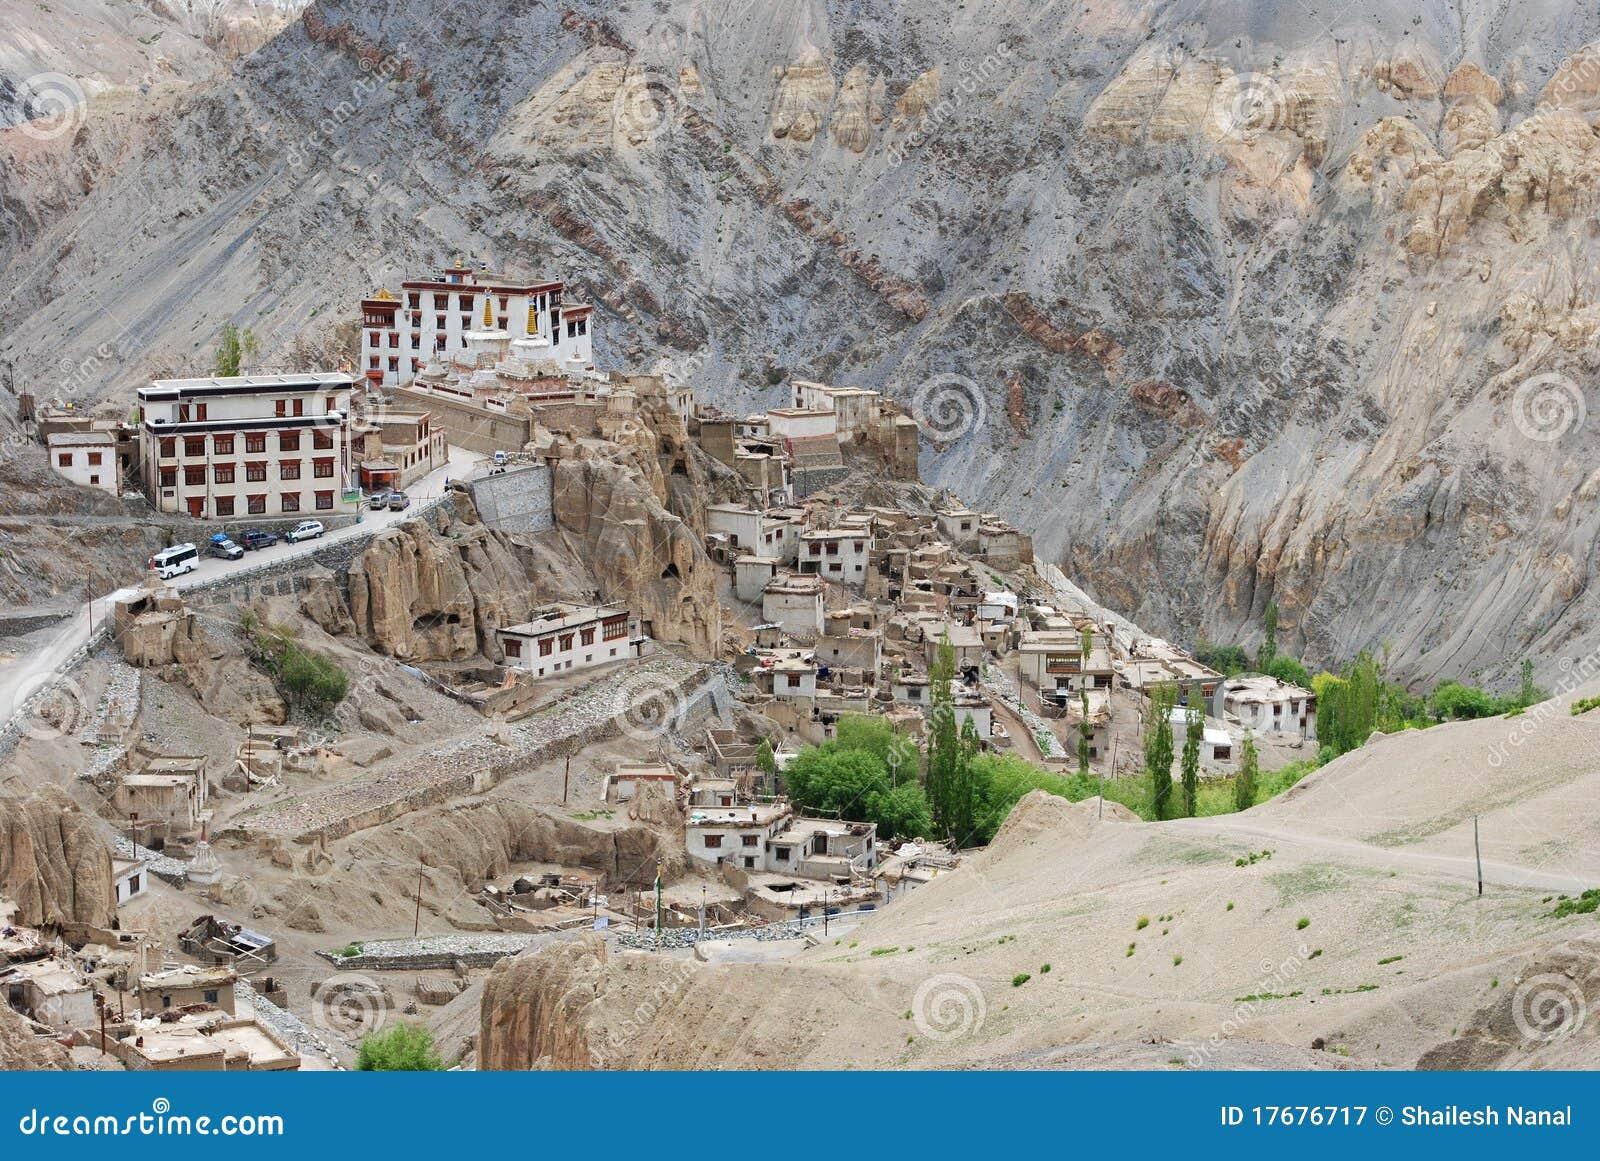 Buddhist Monasteries In Ladakh Valley Royalty Free Stock ...